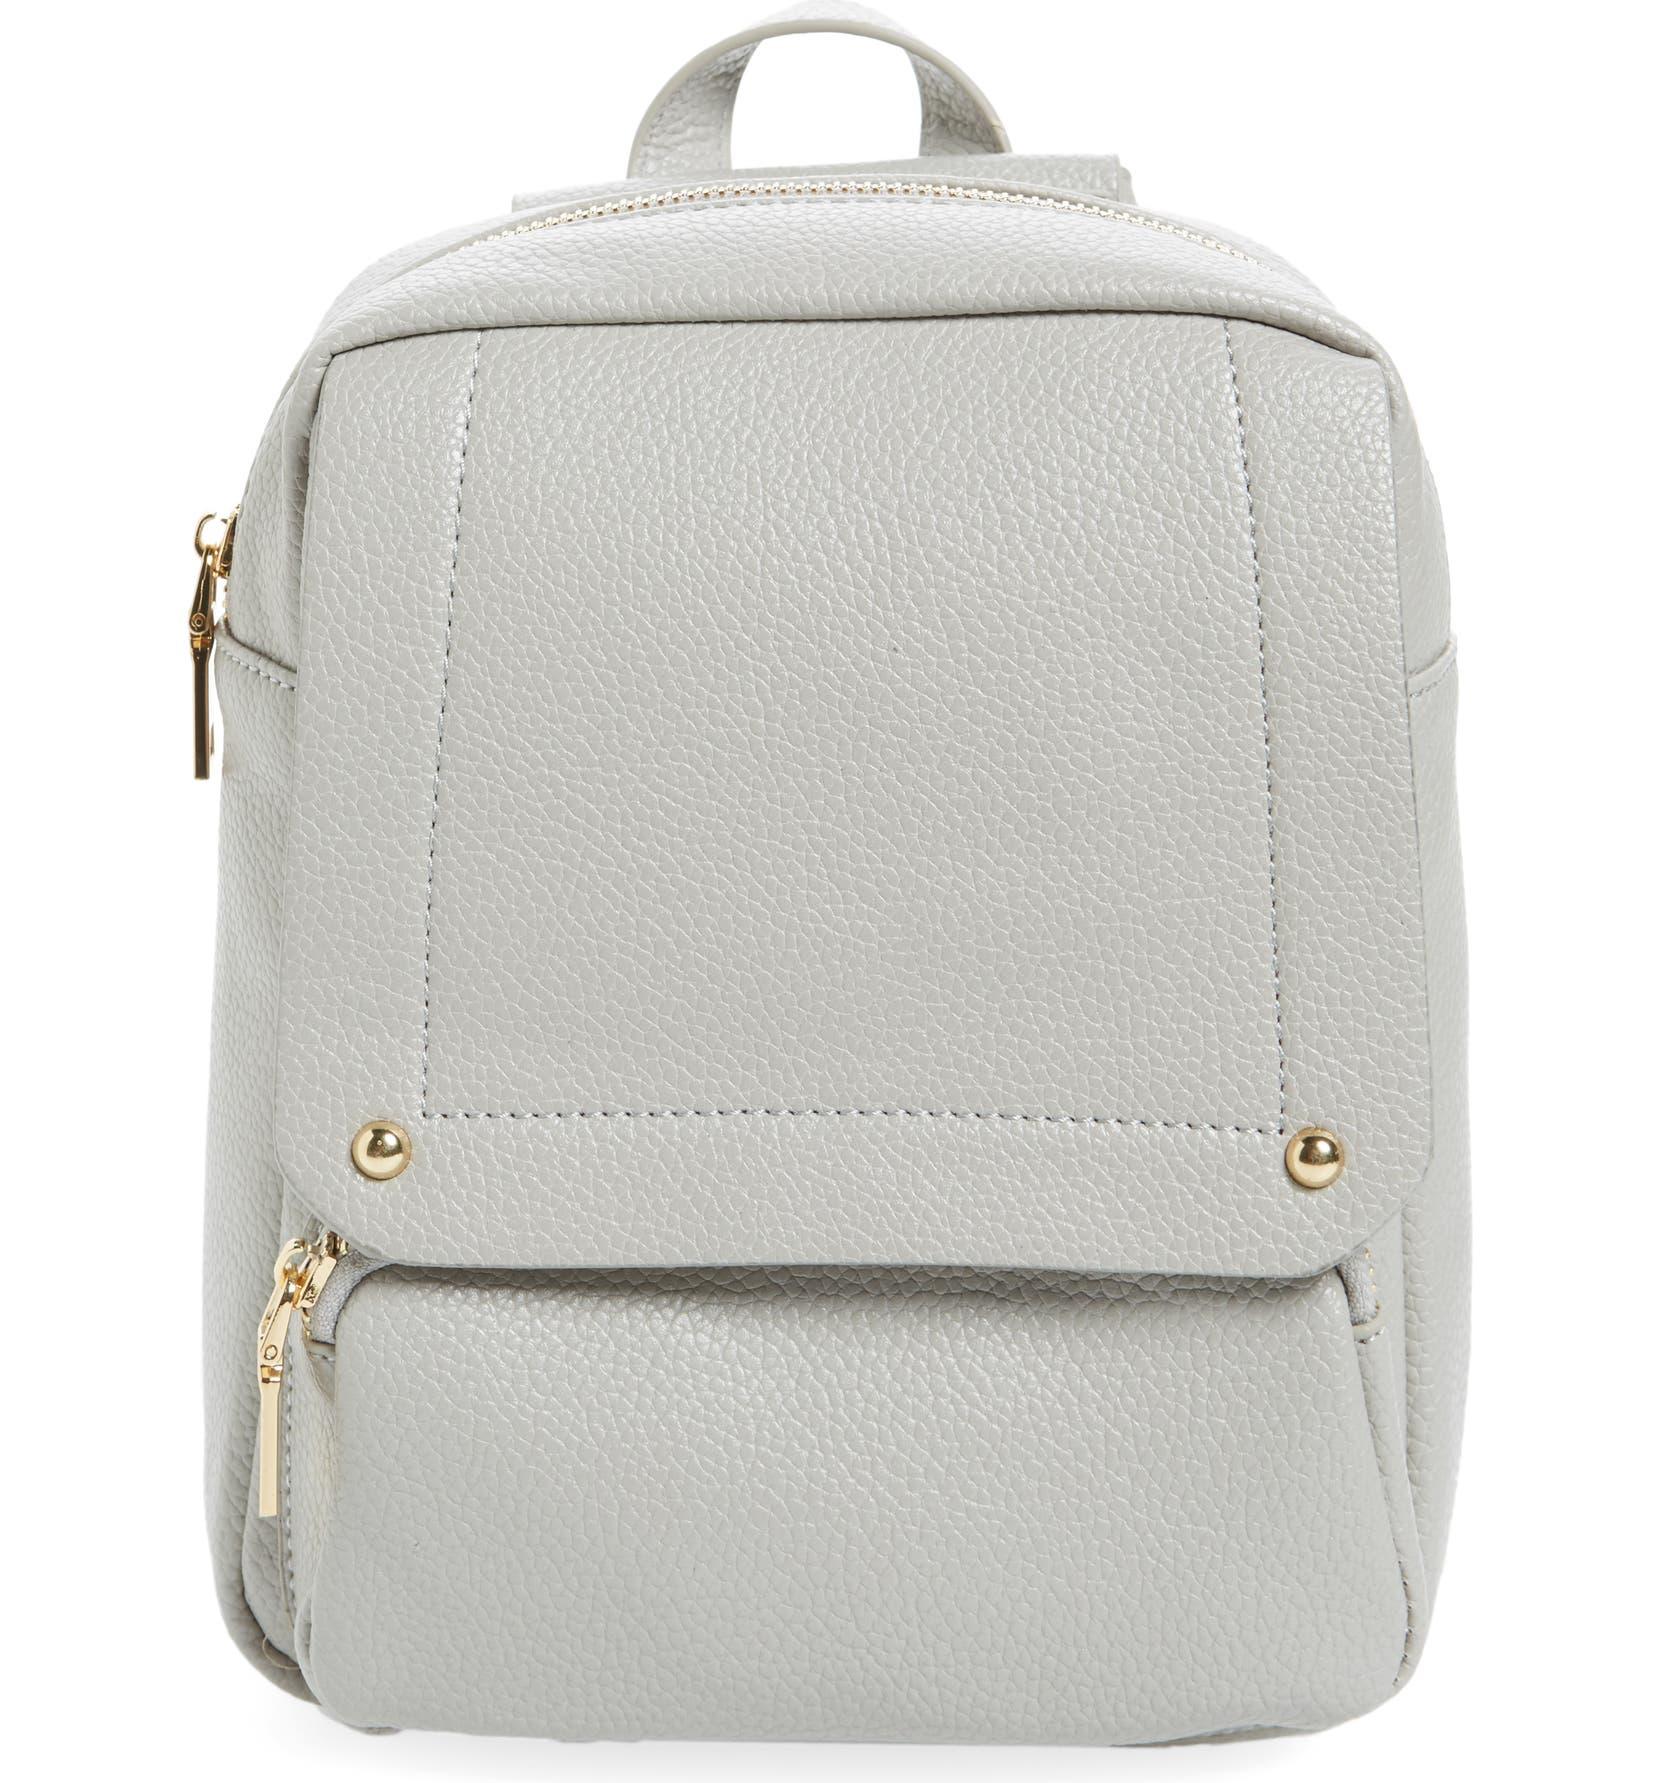 02ab87277305 Girly Faux Leather Flap Mini Backpack- Fenix Toulouse Handball